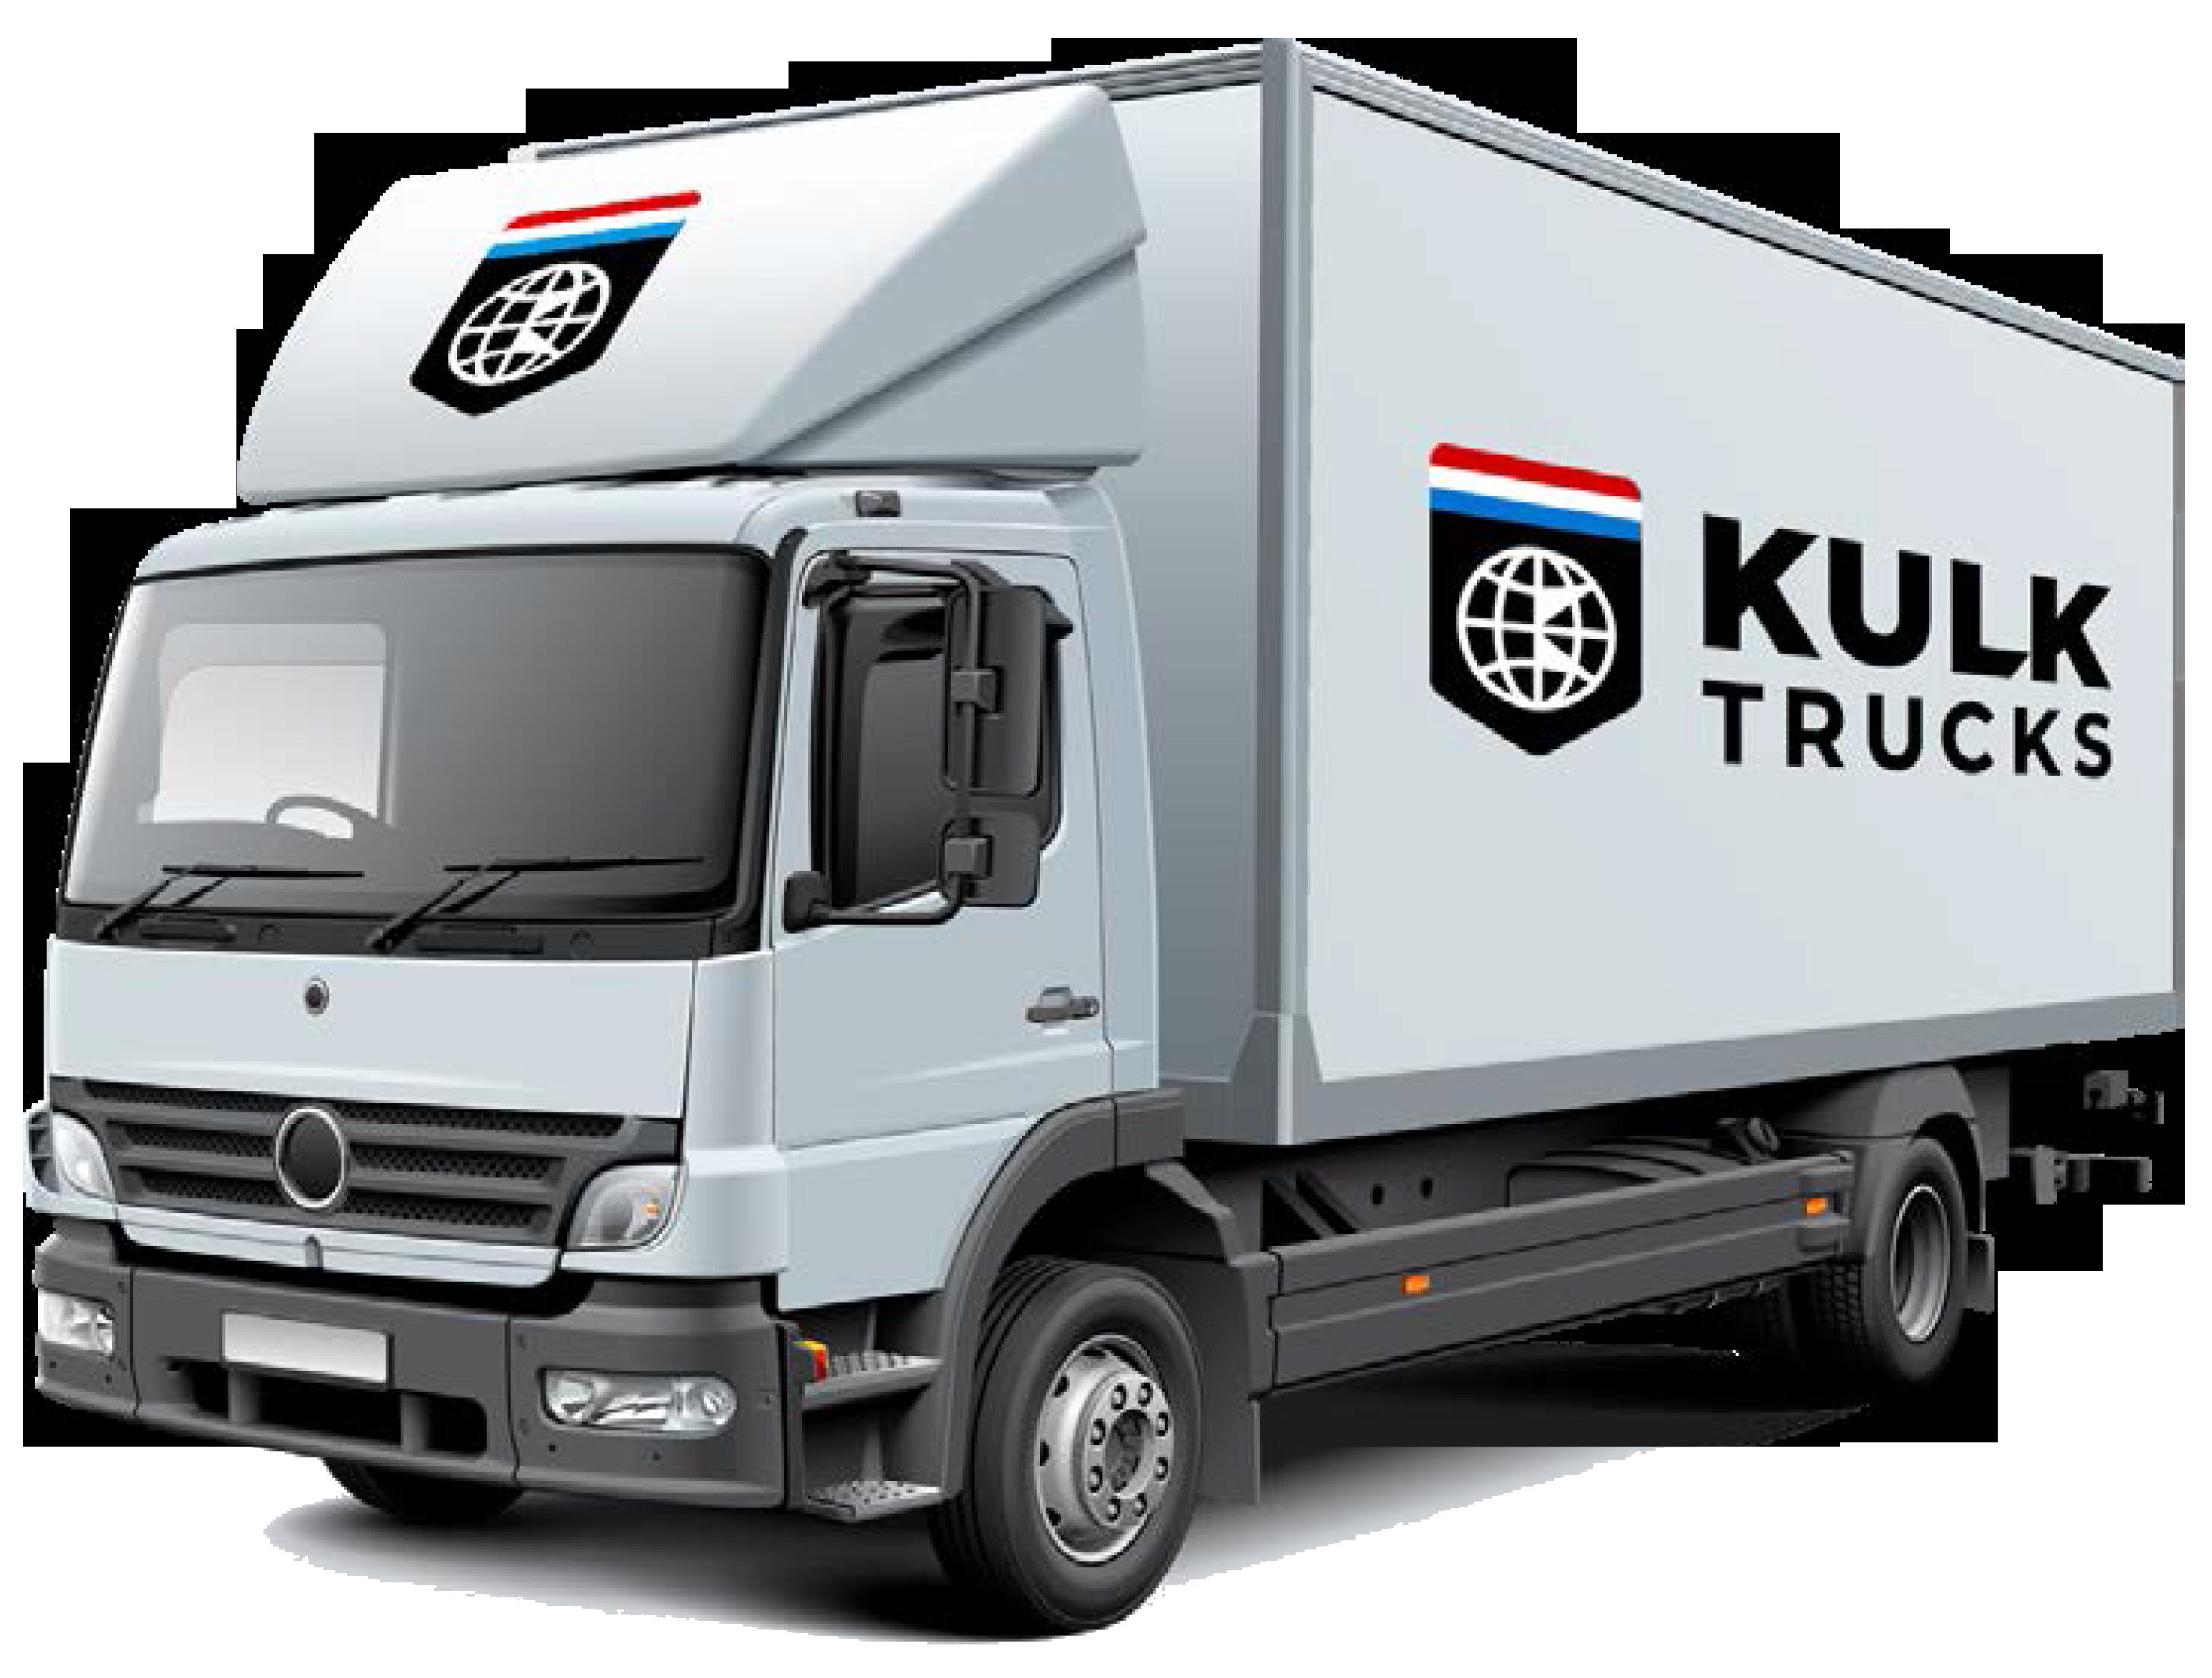 Kulk Trucks